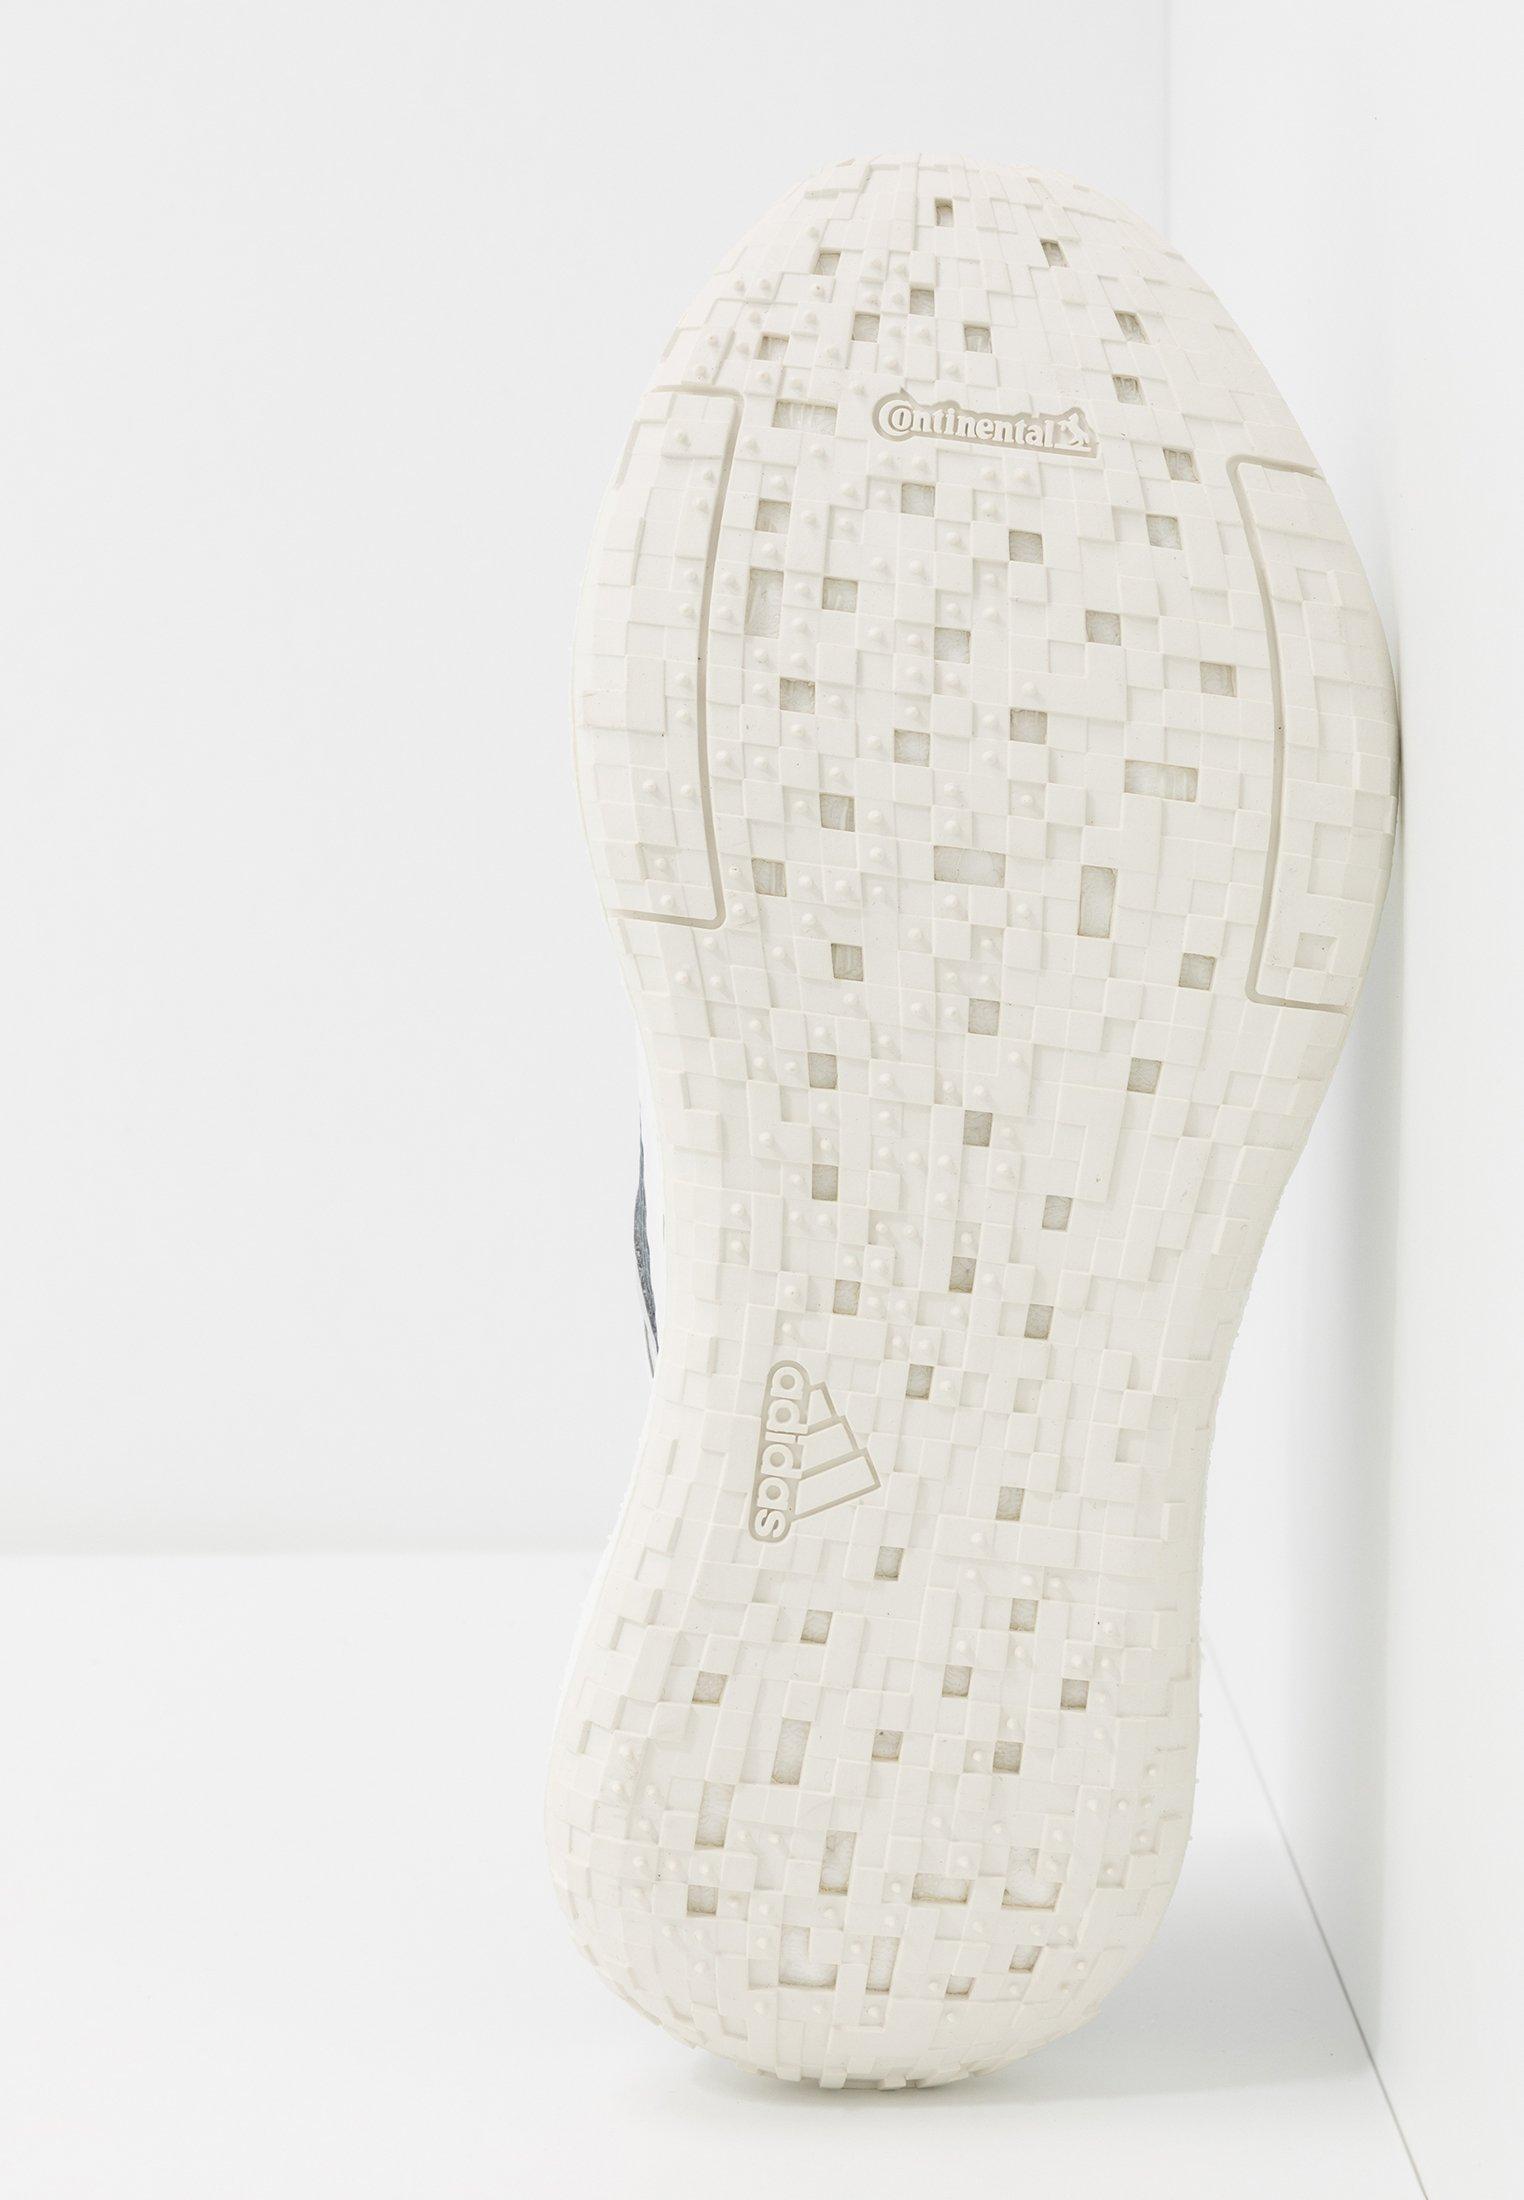 Adidas HdChaussures By Mccartney Core White Running De Neutres Pulseboost Stella iTPZuwOXk